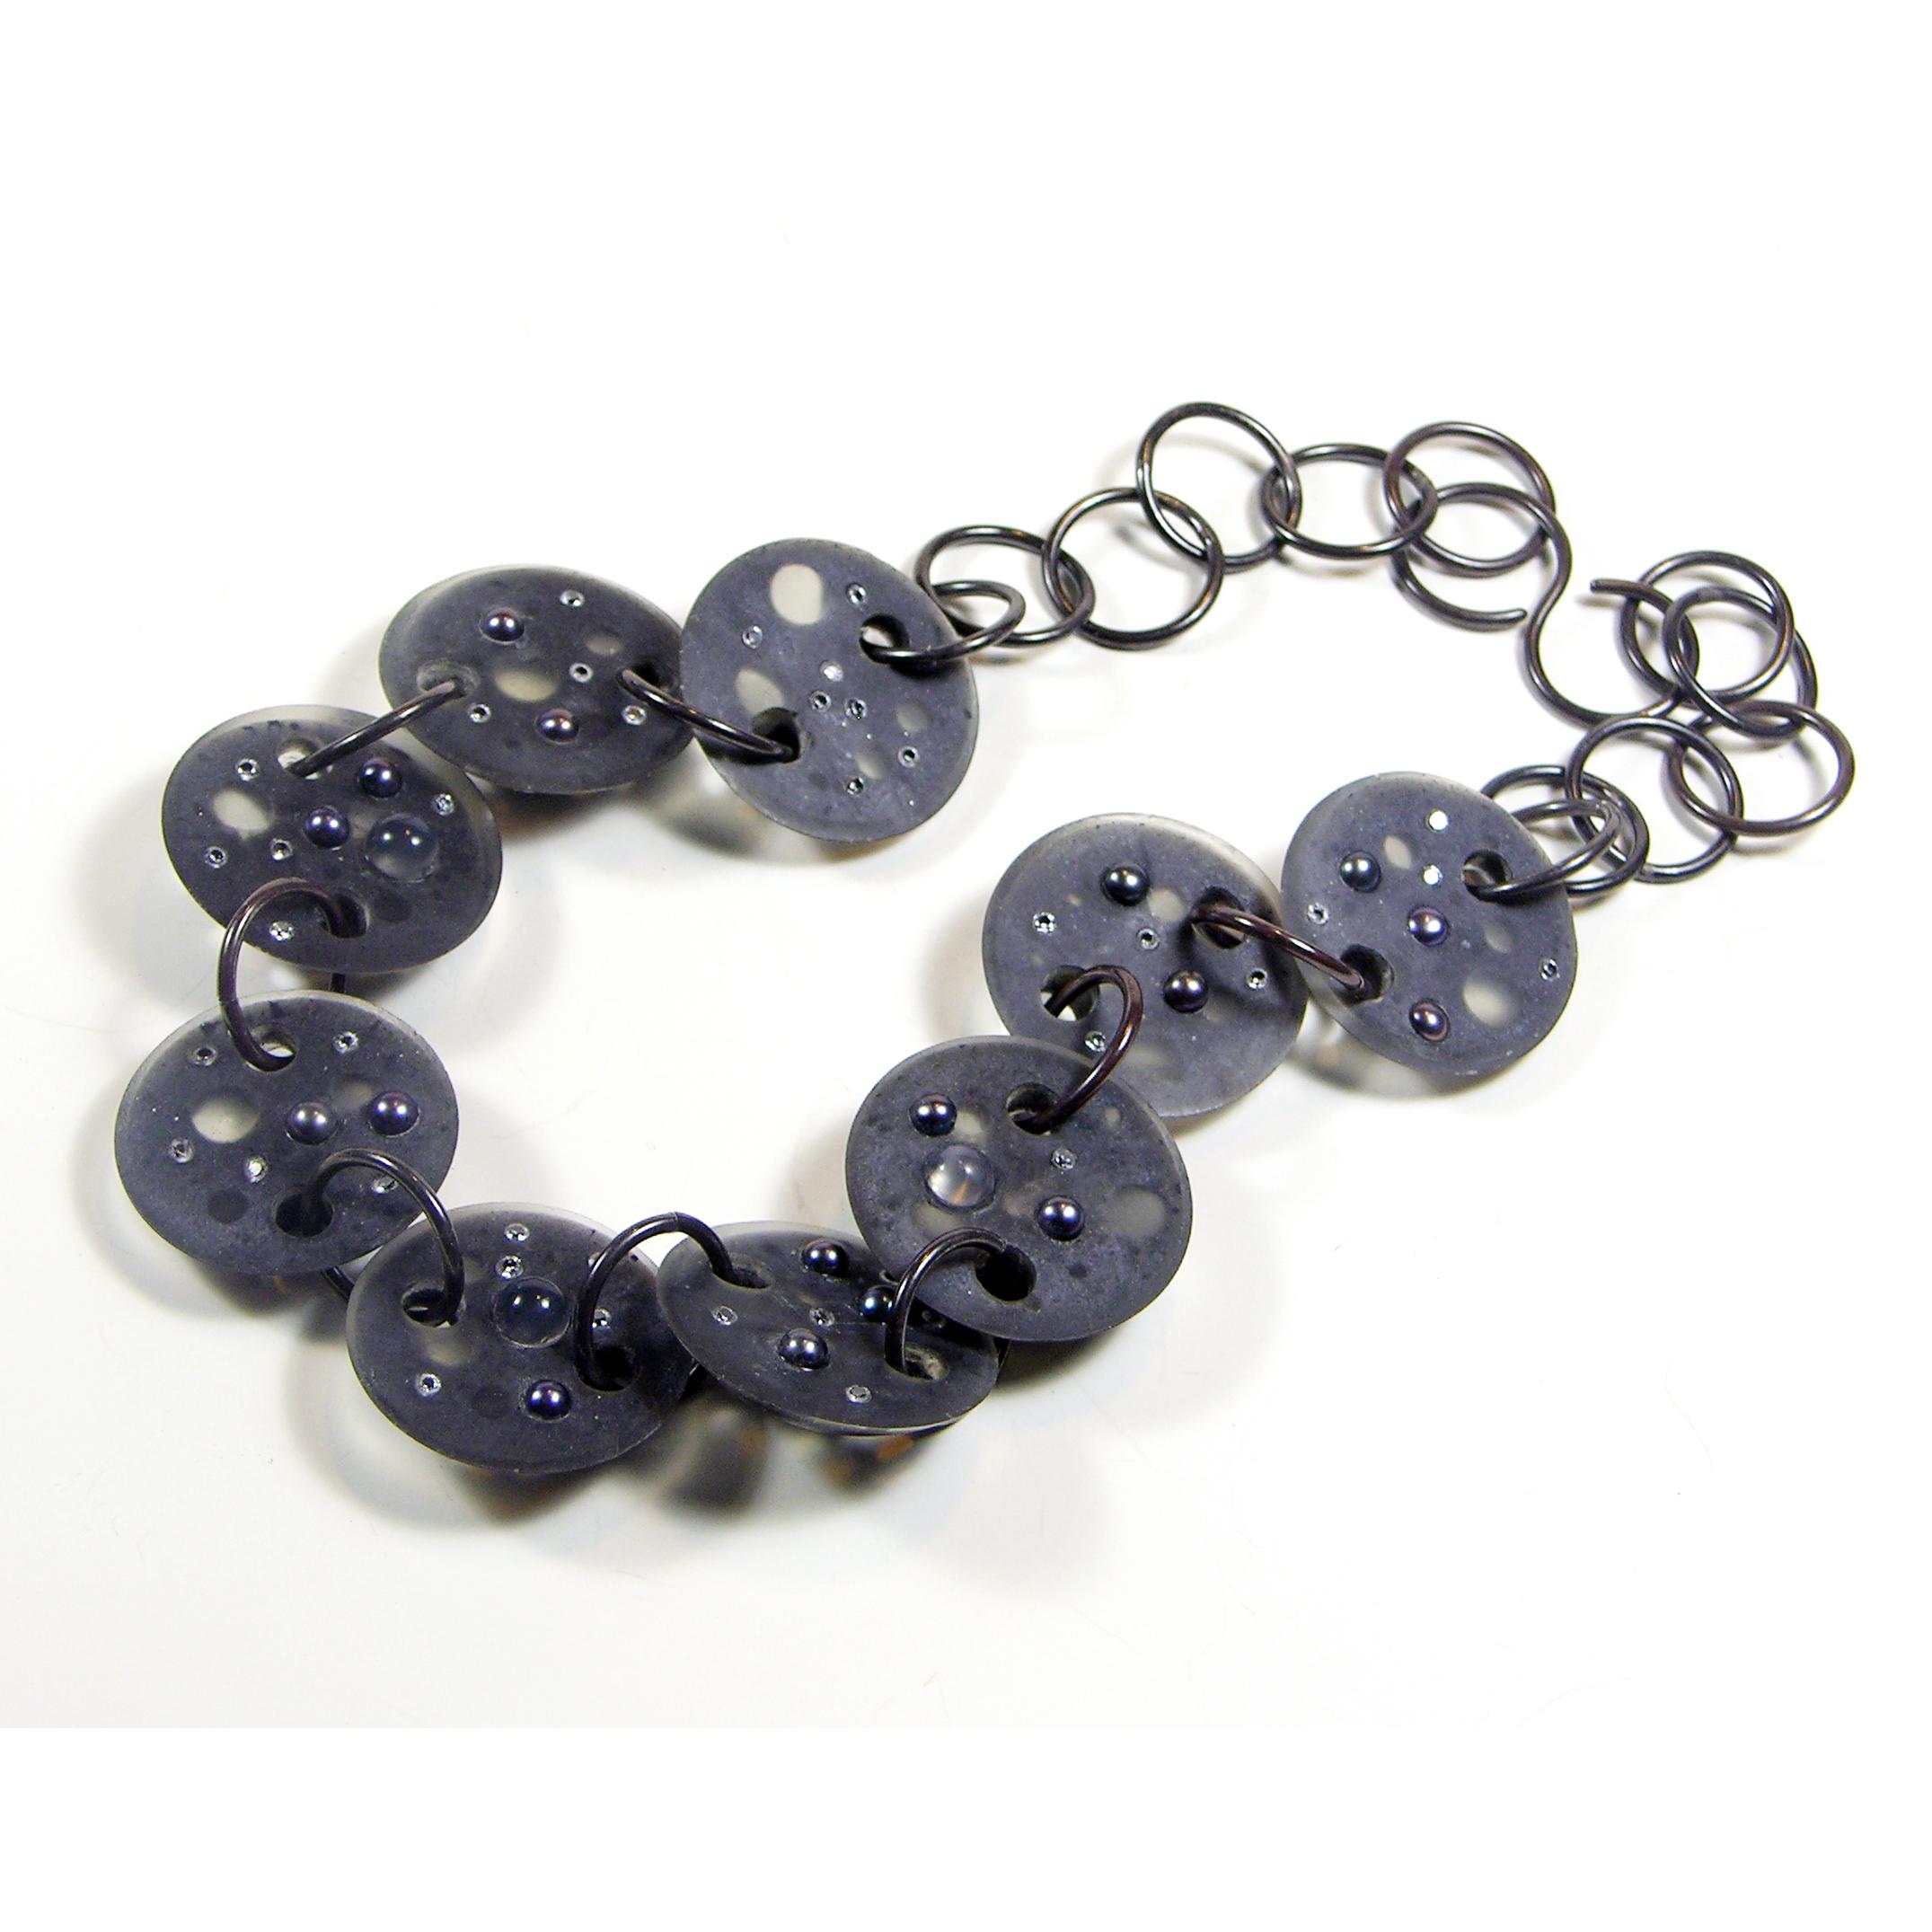 blackmoon_resin necklace.jpg